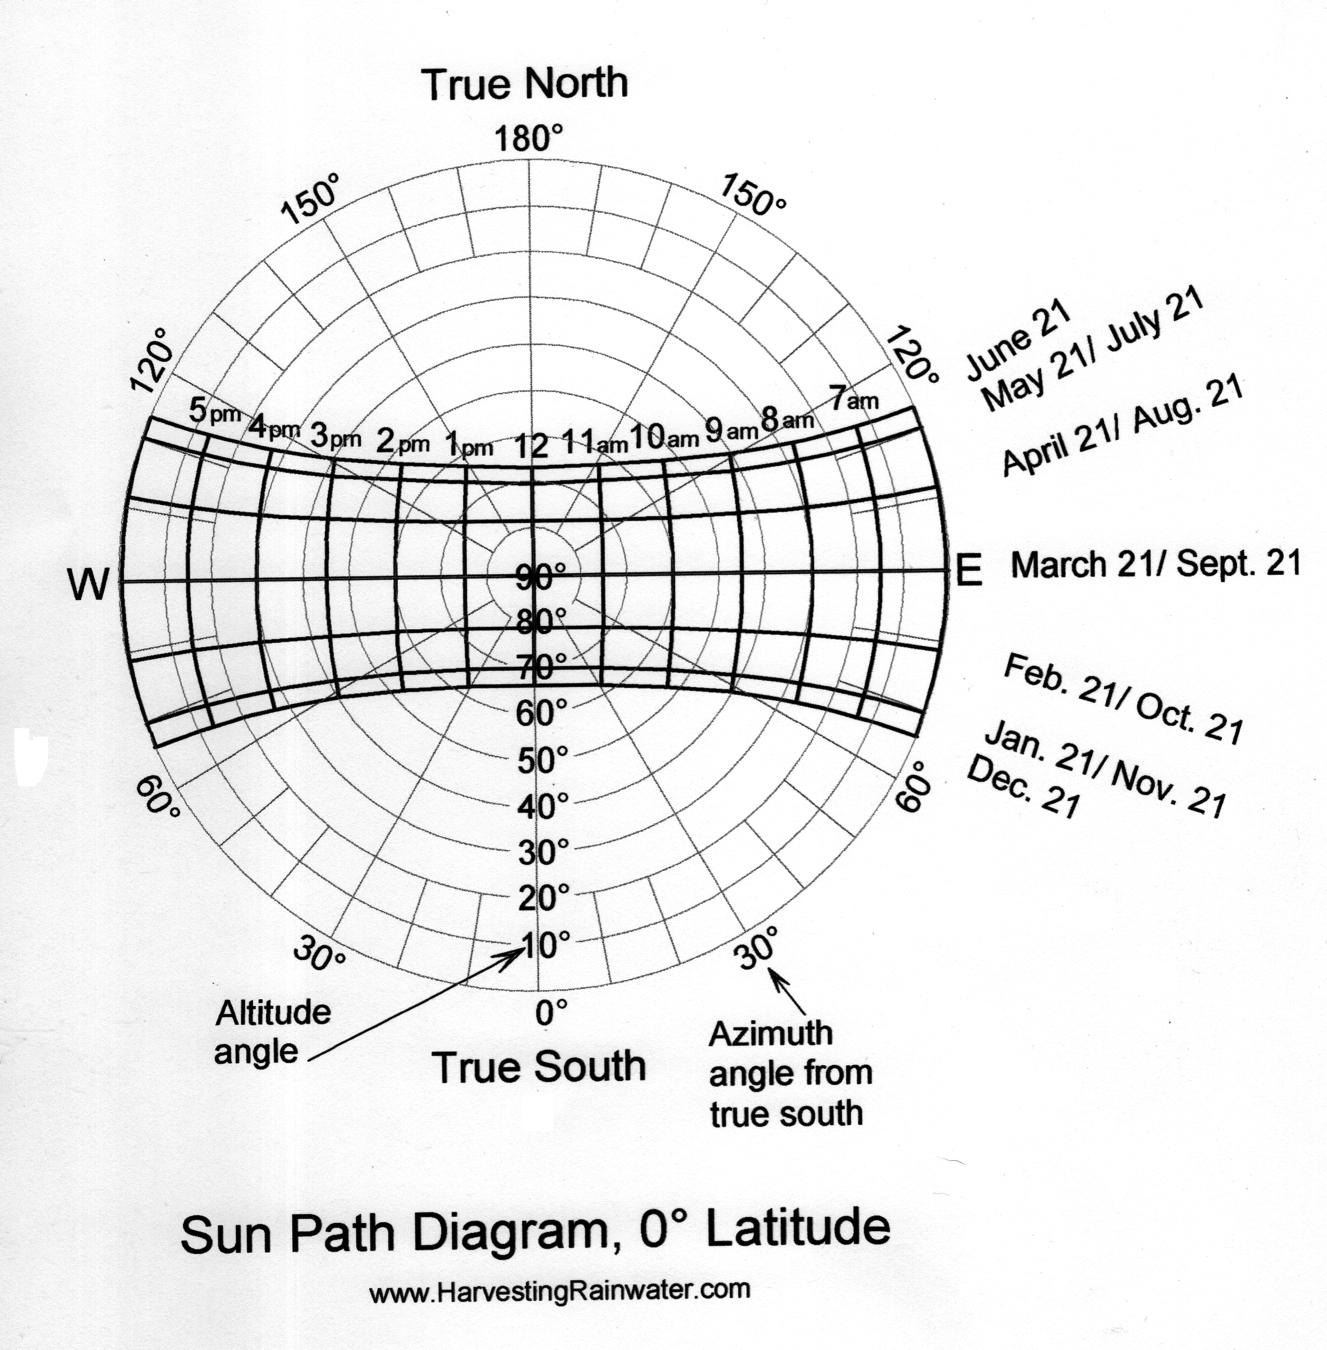 hight resolution of sun path diagram 0 latitude